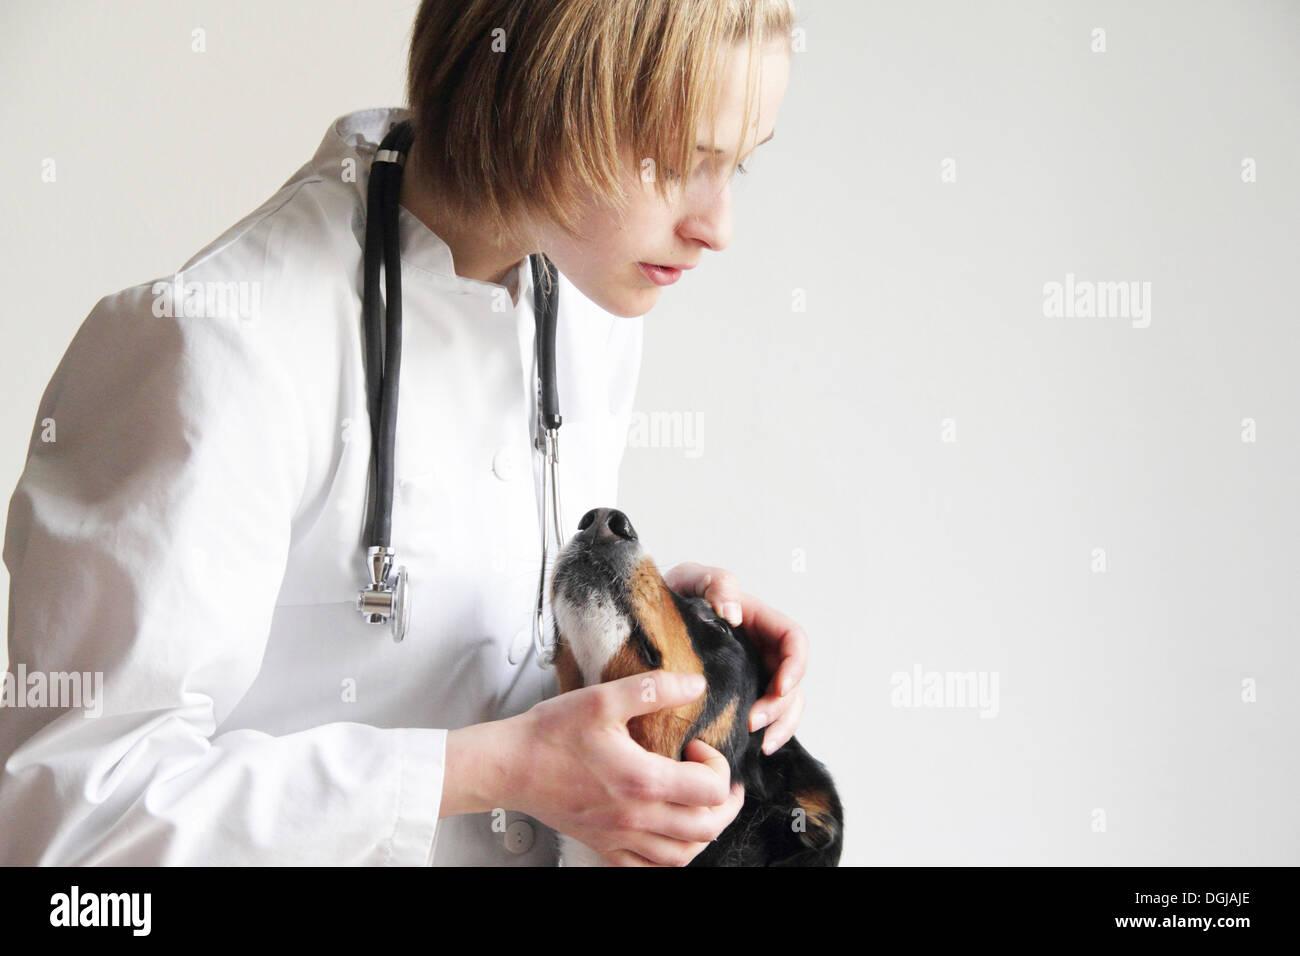 Female veterinarian examining dogs eye - Stock Image